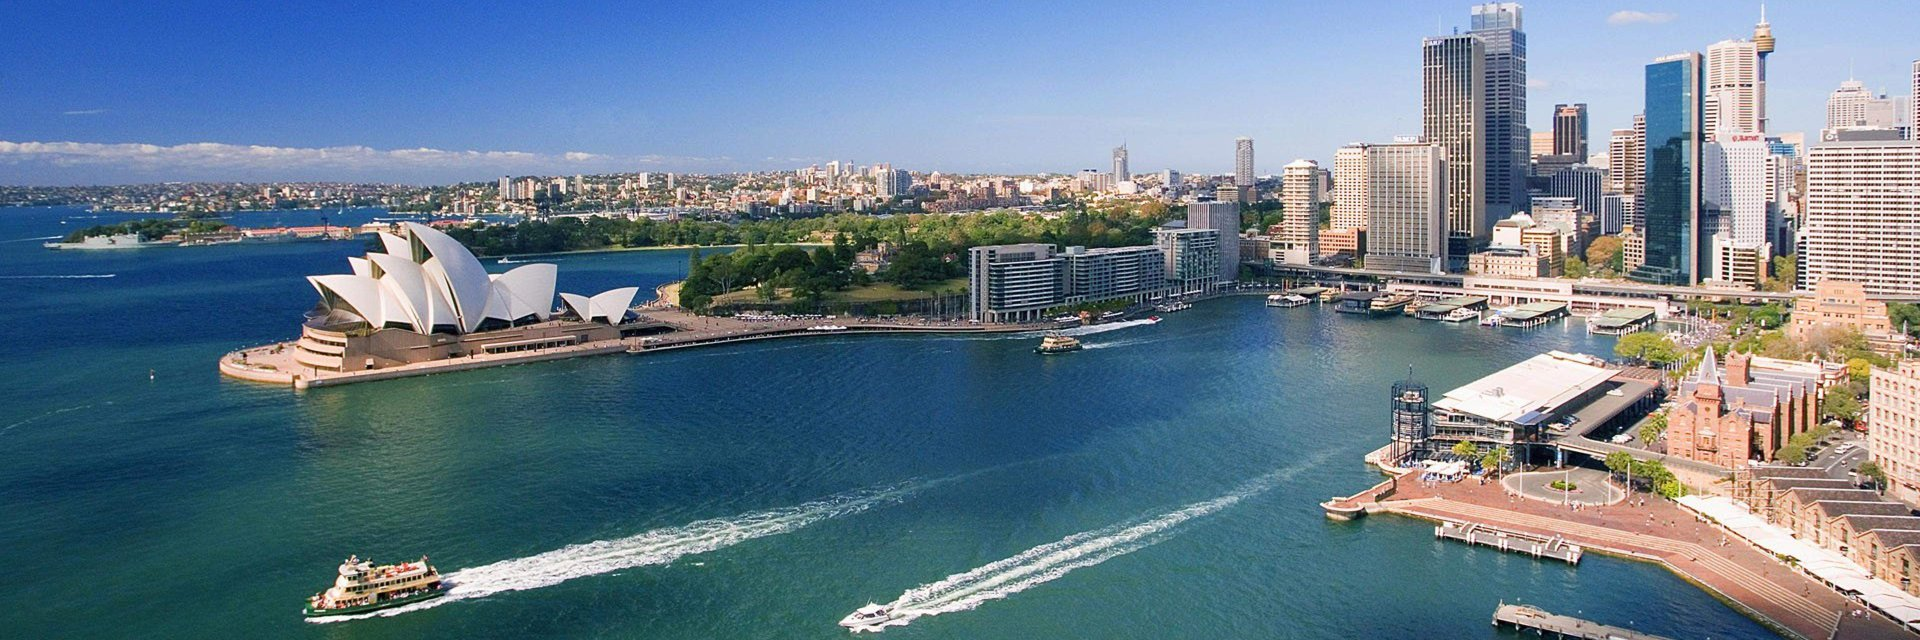 Туры на курорт Дарвин (Австралия) в мае 2021 из Москвы, цены на отдых на курорте Дарвин в мае - ПАКС